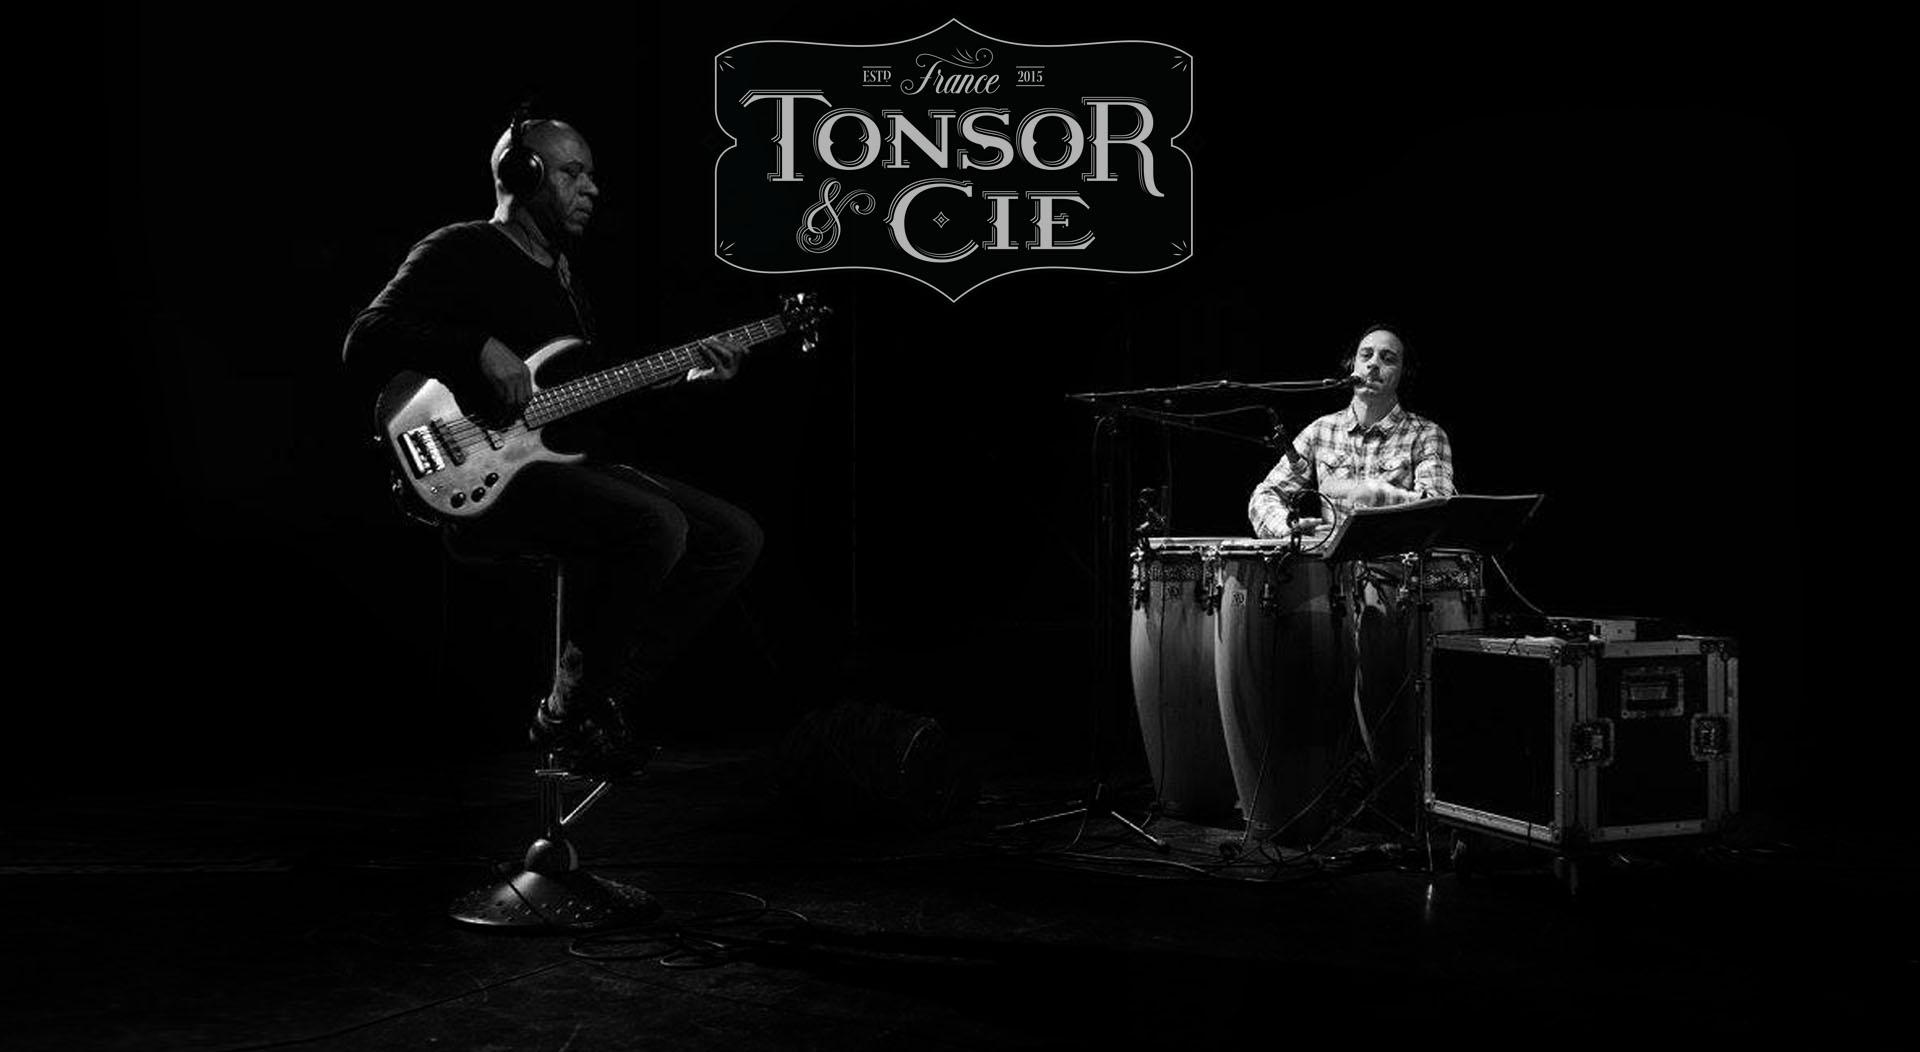 locoson_tonsor_cie_toulouse_concert_social_club_live_music_2019